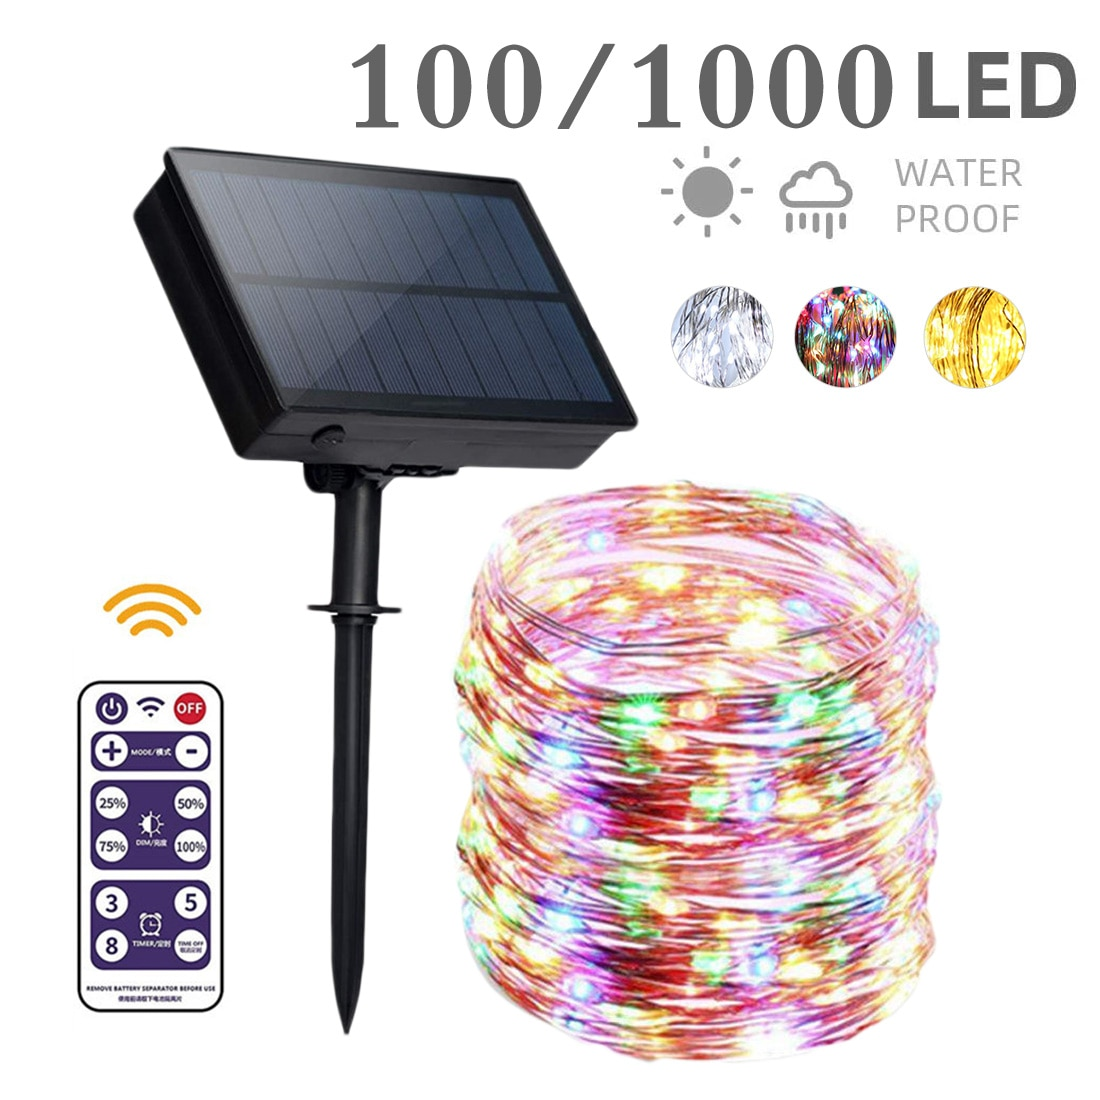 Cable de cobre Multicolor a prueba de agua, lámpara LED Solar para exteriores, tira de luces 100/200/300 guirnaldas de luces LED para vacaciones, fiesta de navidad